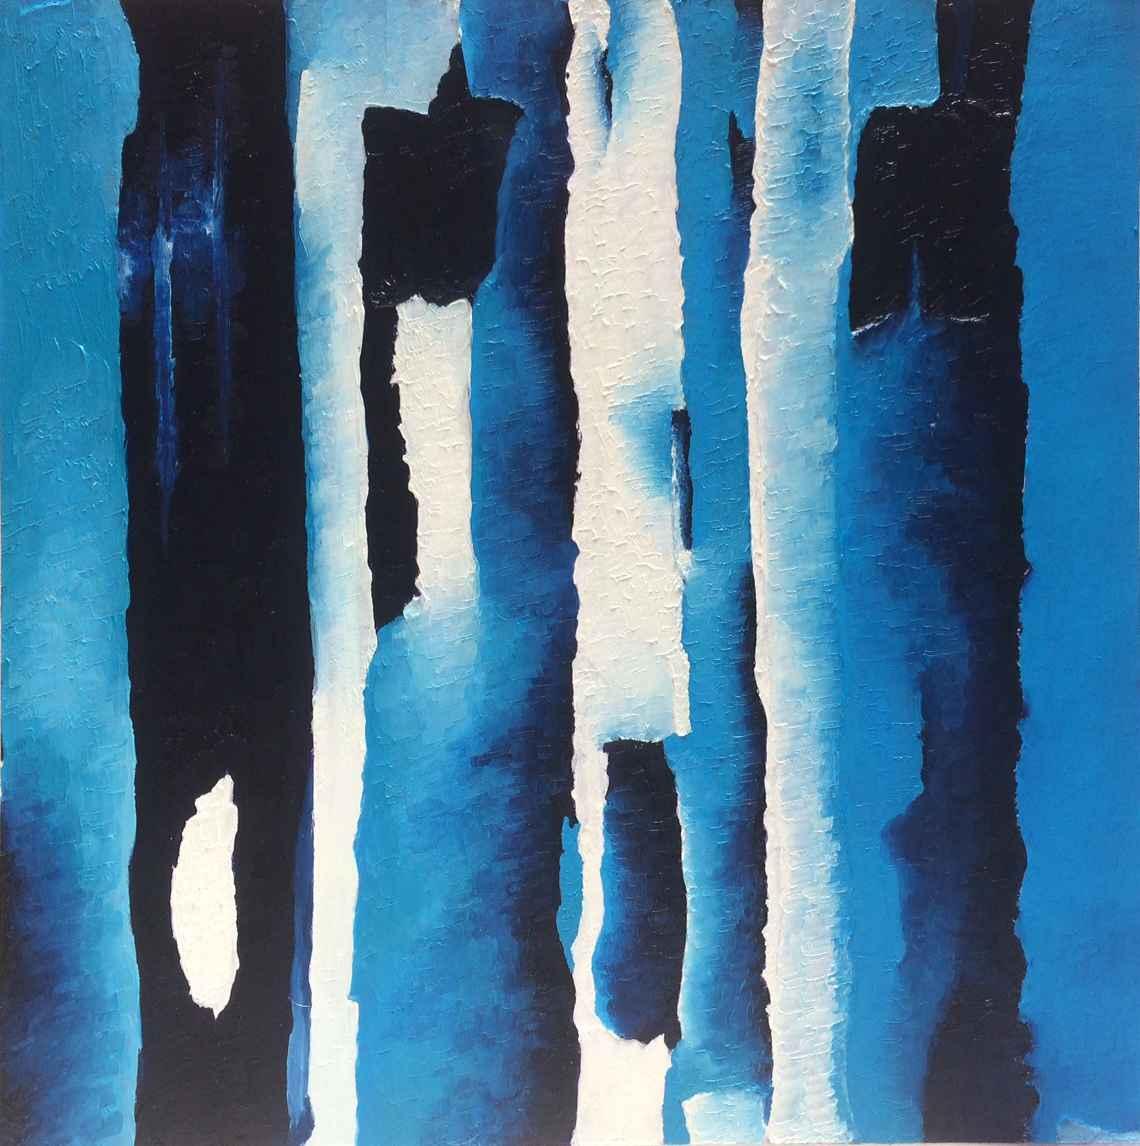 Deep Blue Secrets - The Jail